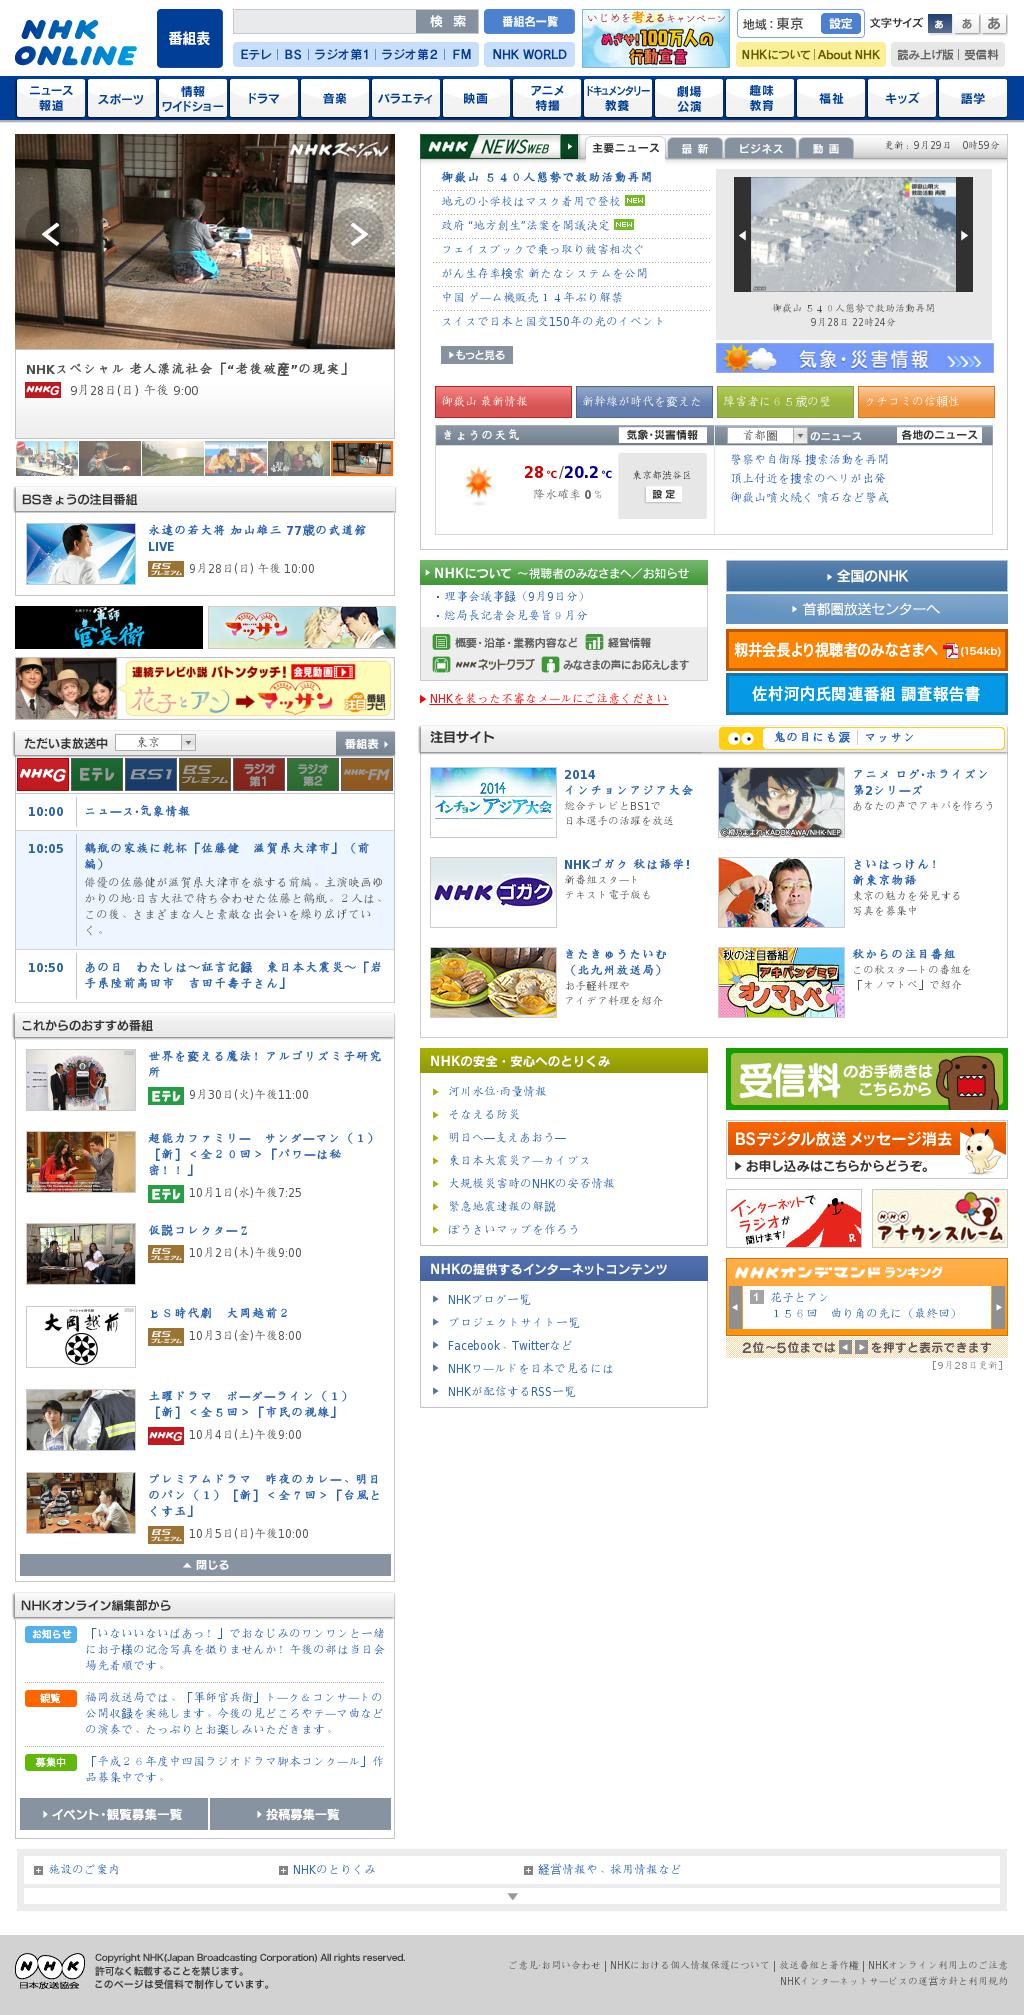 NHK Online at Monday Sept. 29, 2014, 1:13 a.m. UTC